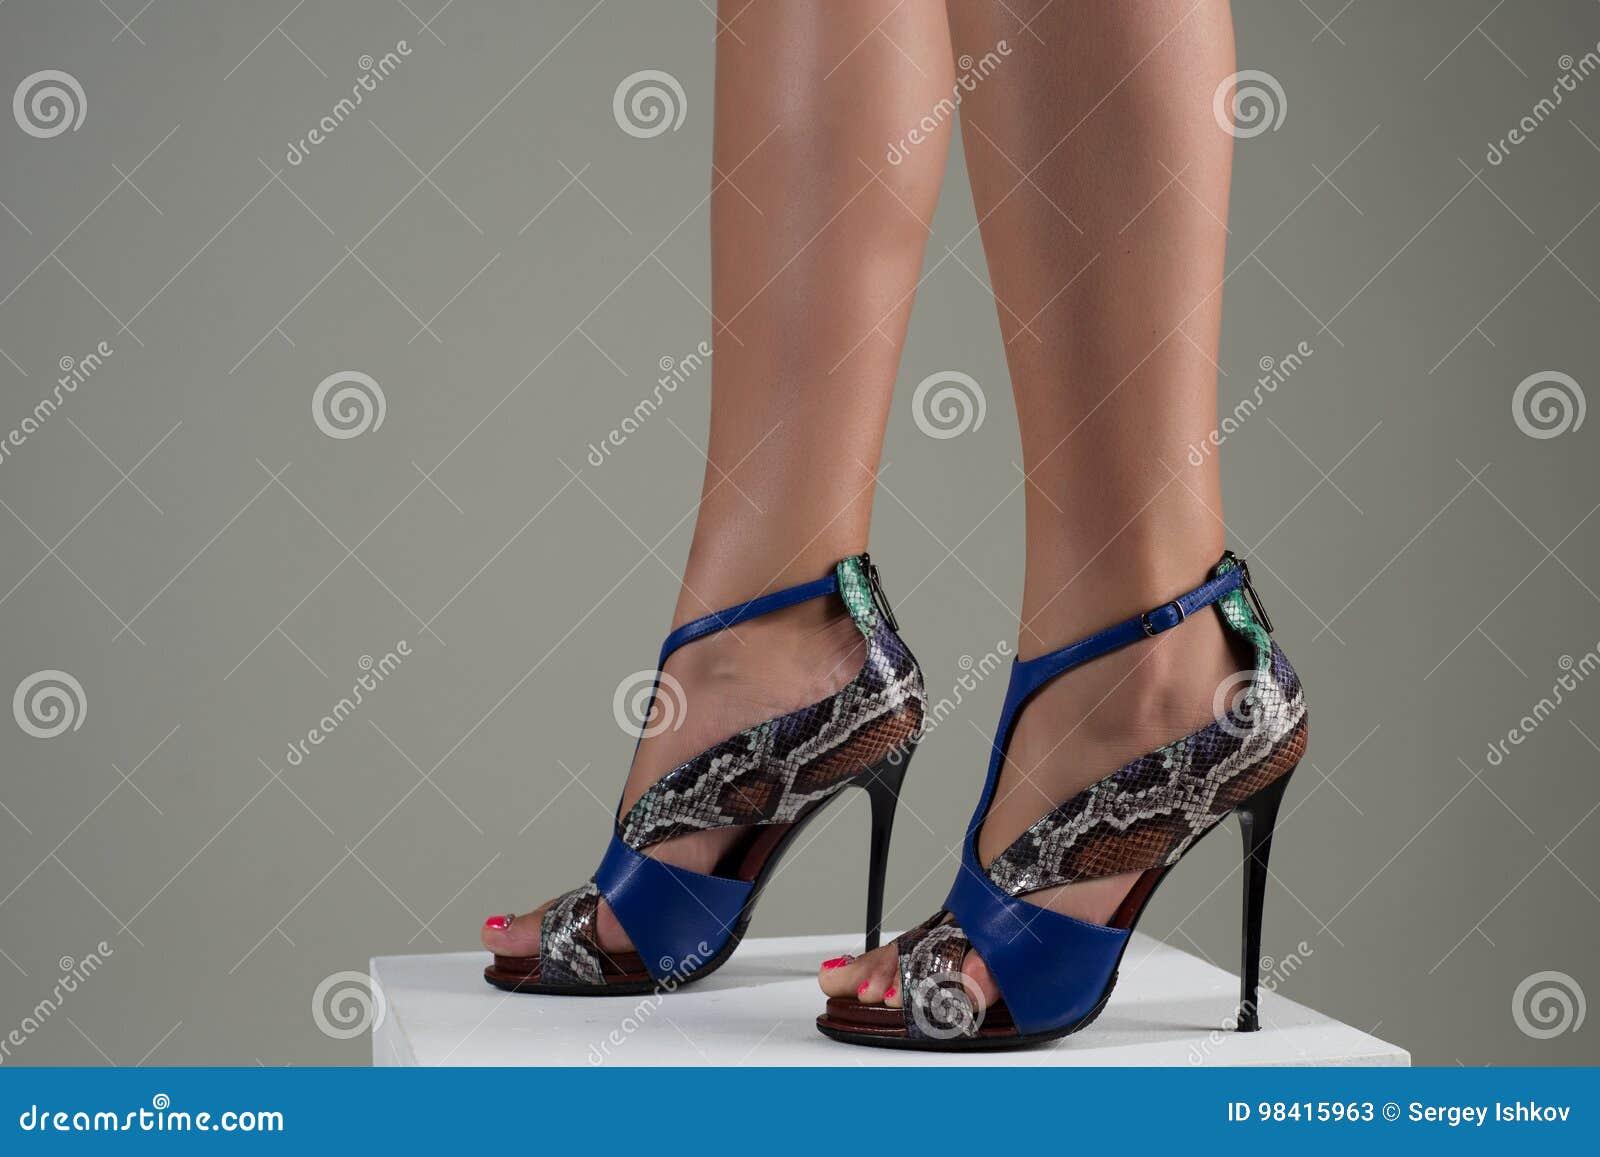 Beautiful female feet in stylish blue high-heeled sandals